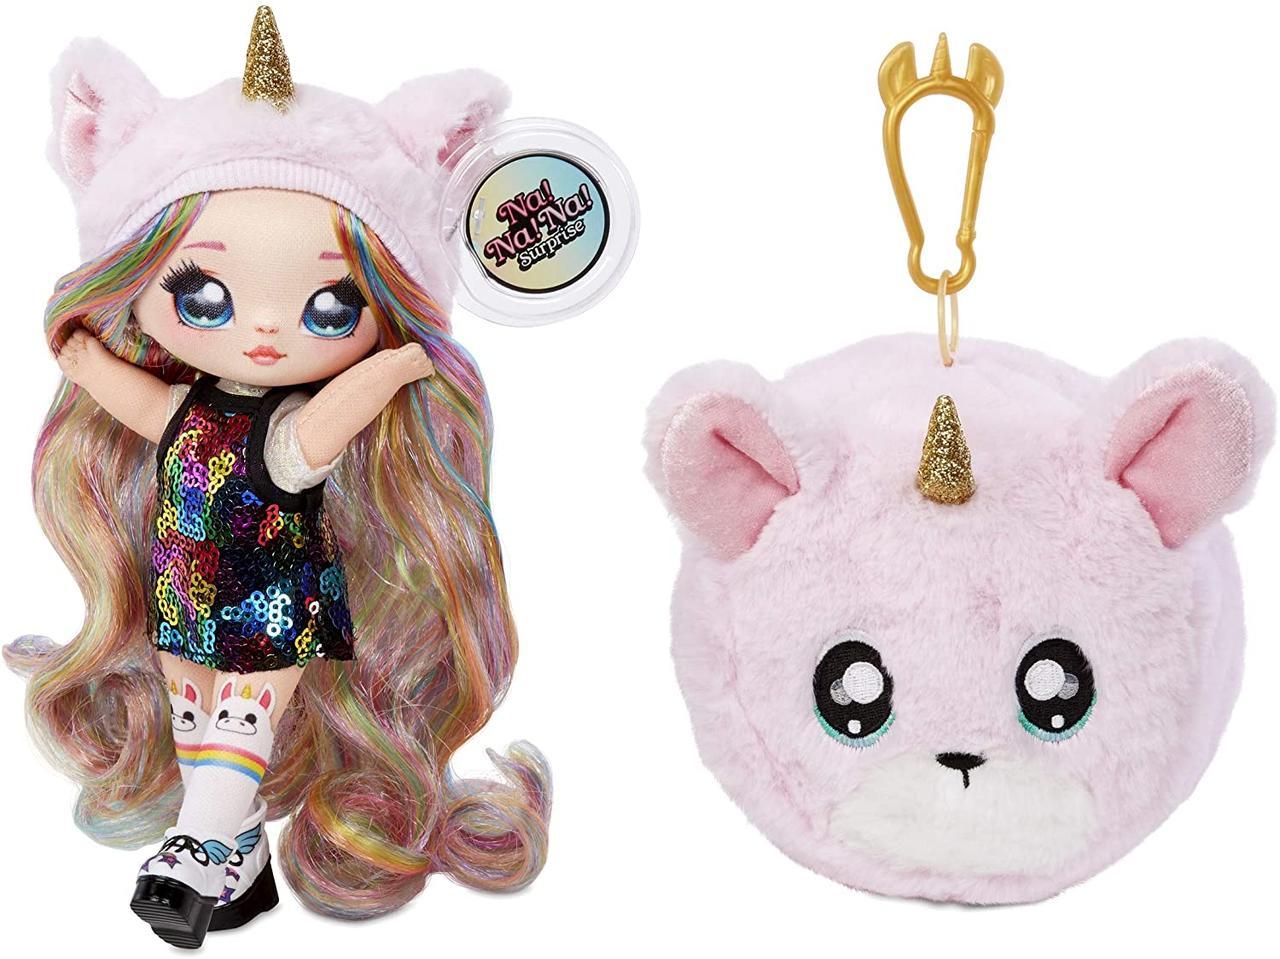 Кукла На На На сюрприз Конфетити Na! Na! Na! Surprise 2-in-1 Fashion Doll & Plush Pom MGA